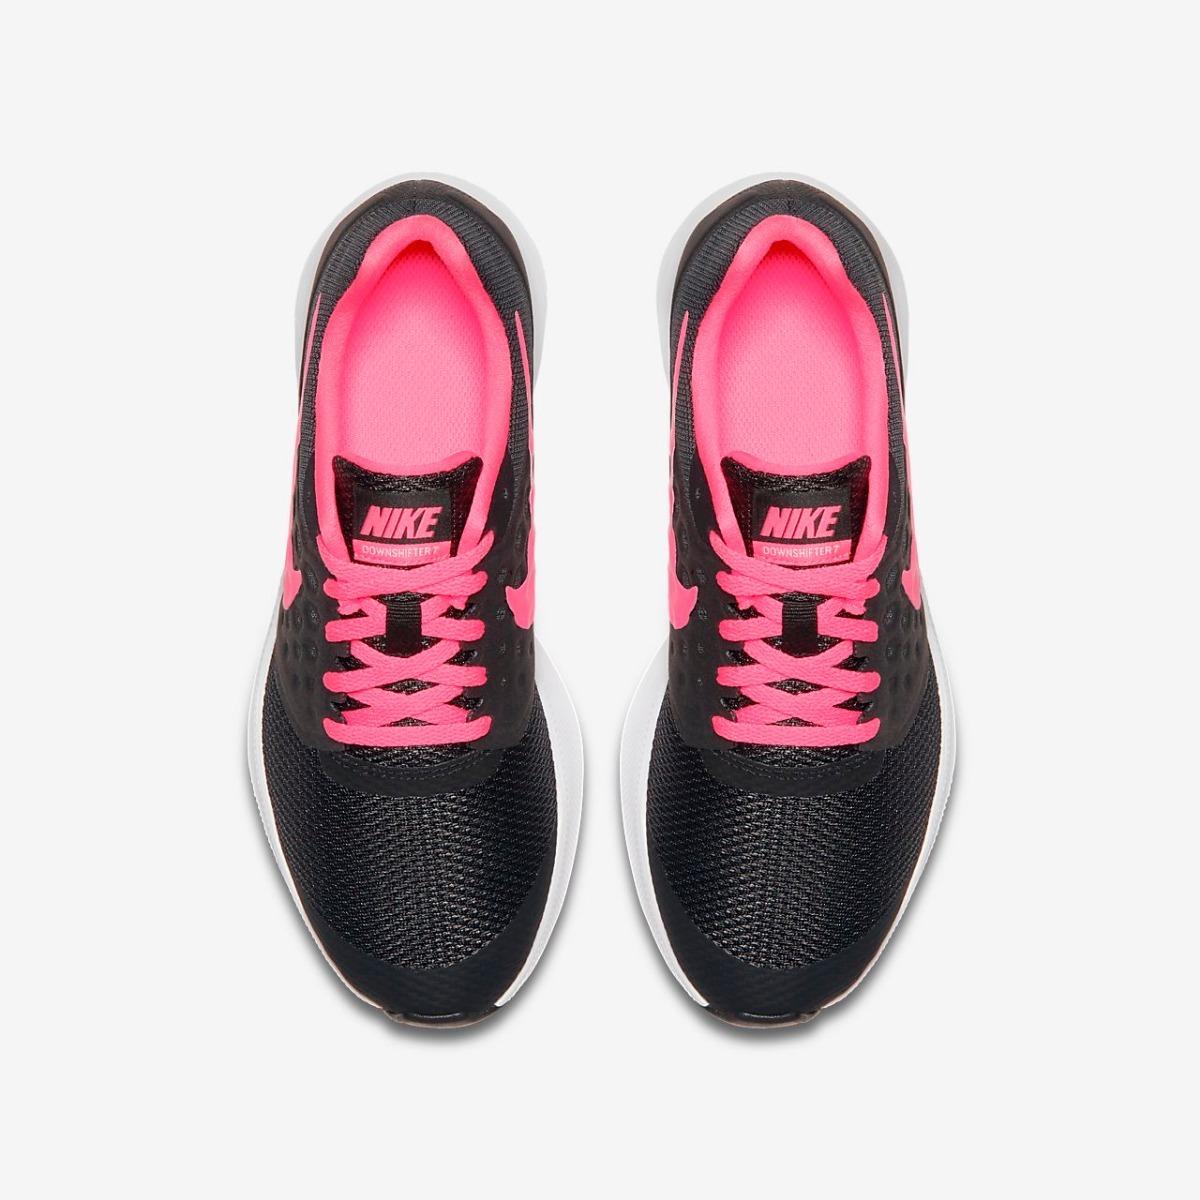 7c446ae3f8501 tenis nike downshifter 7 mujer gym correr running gimnasio. Cargando zoom.